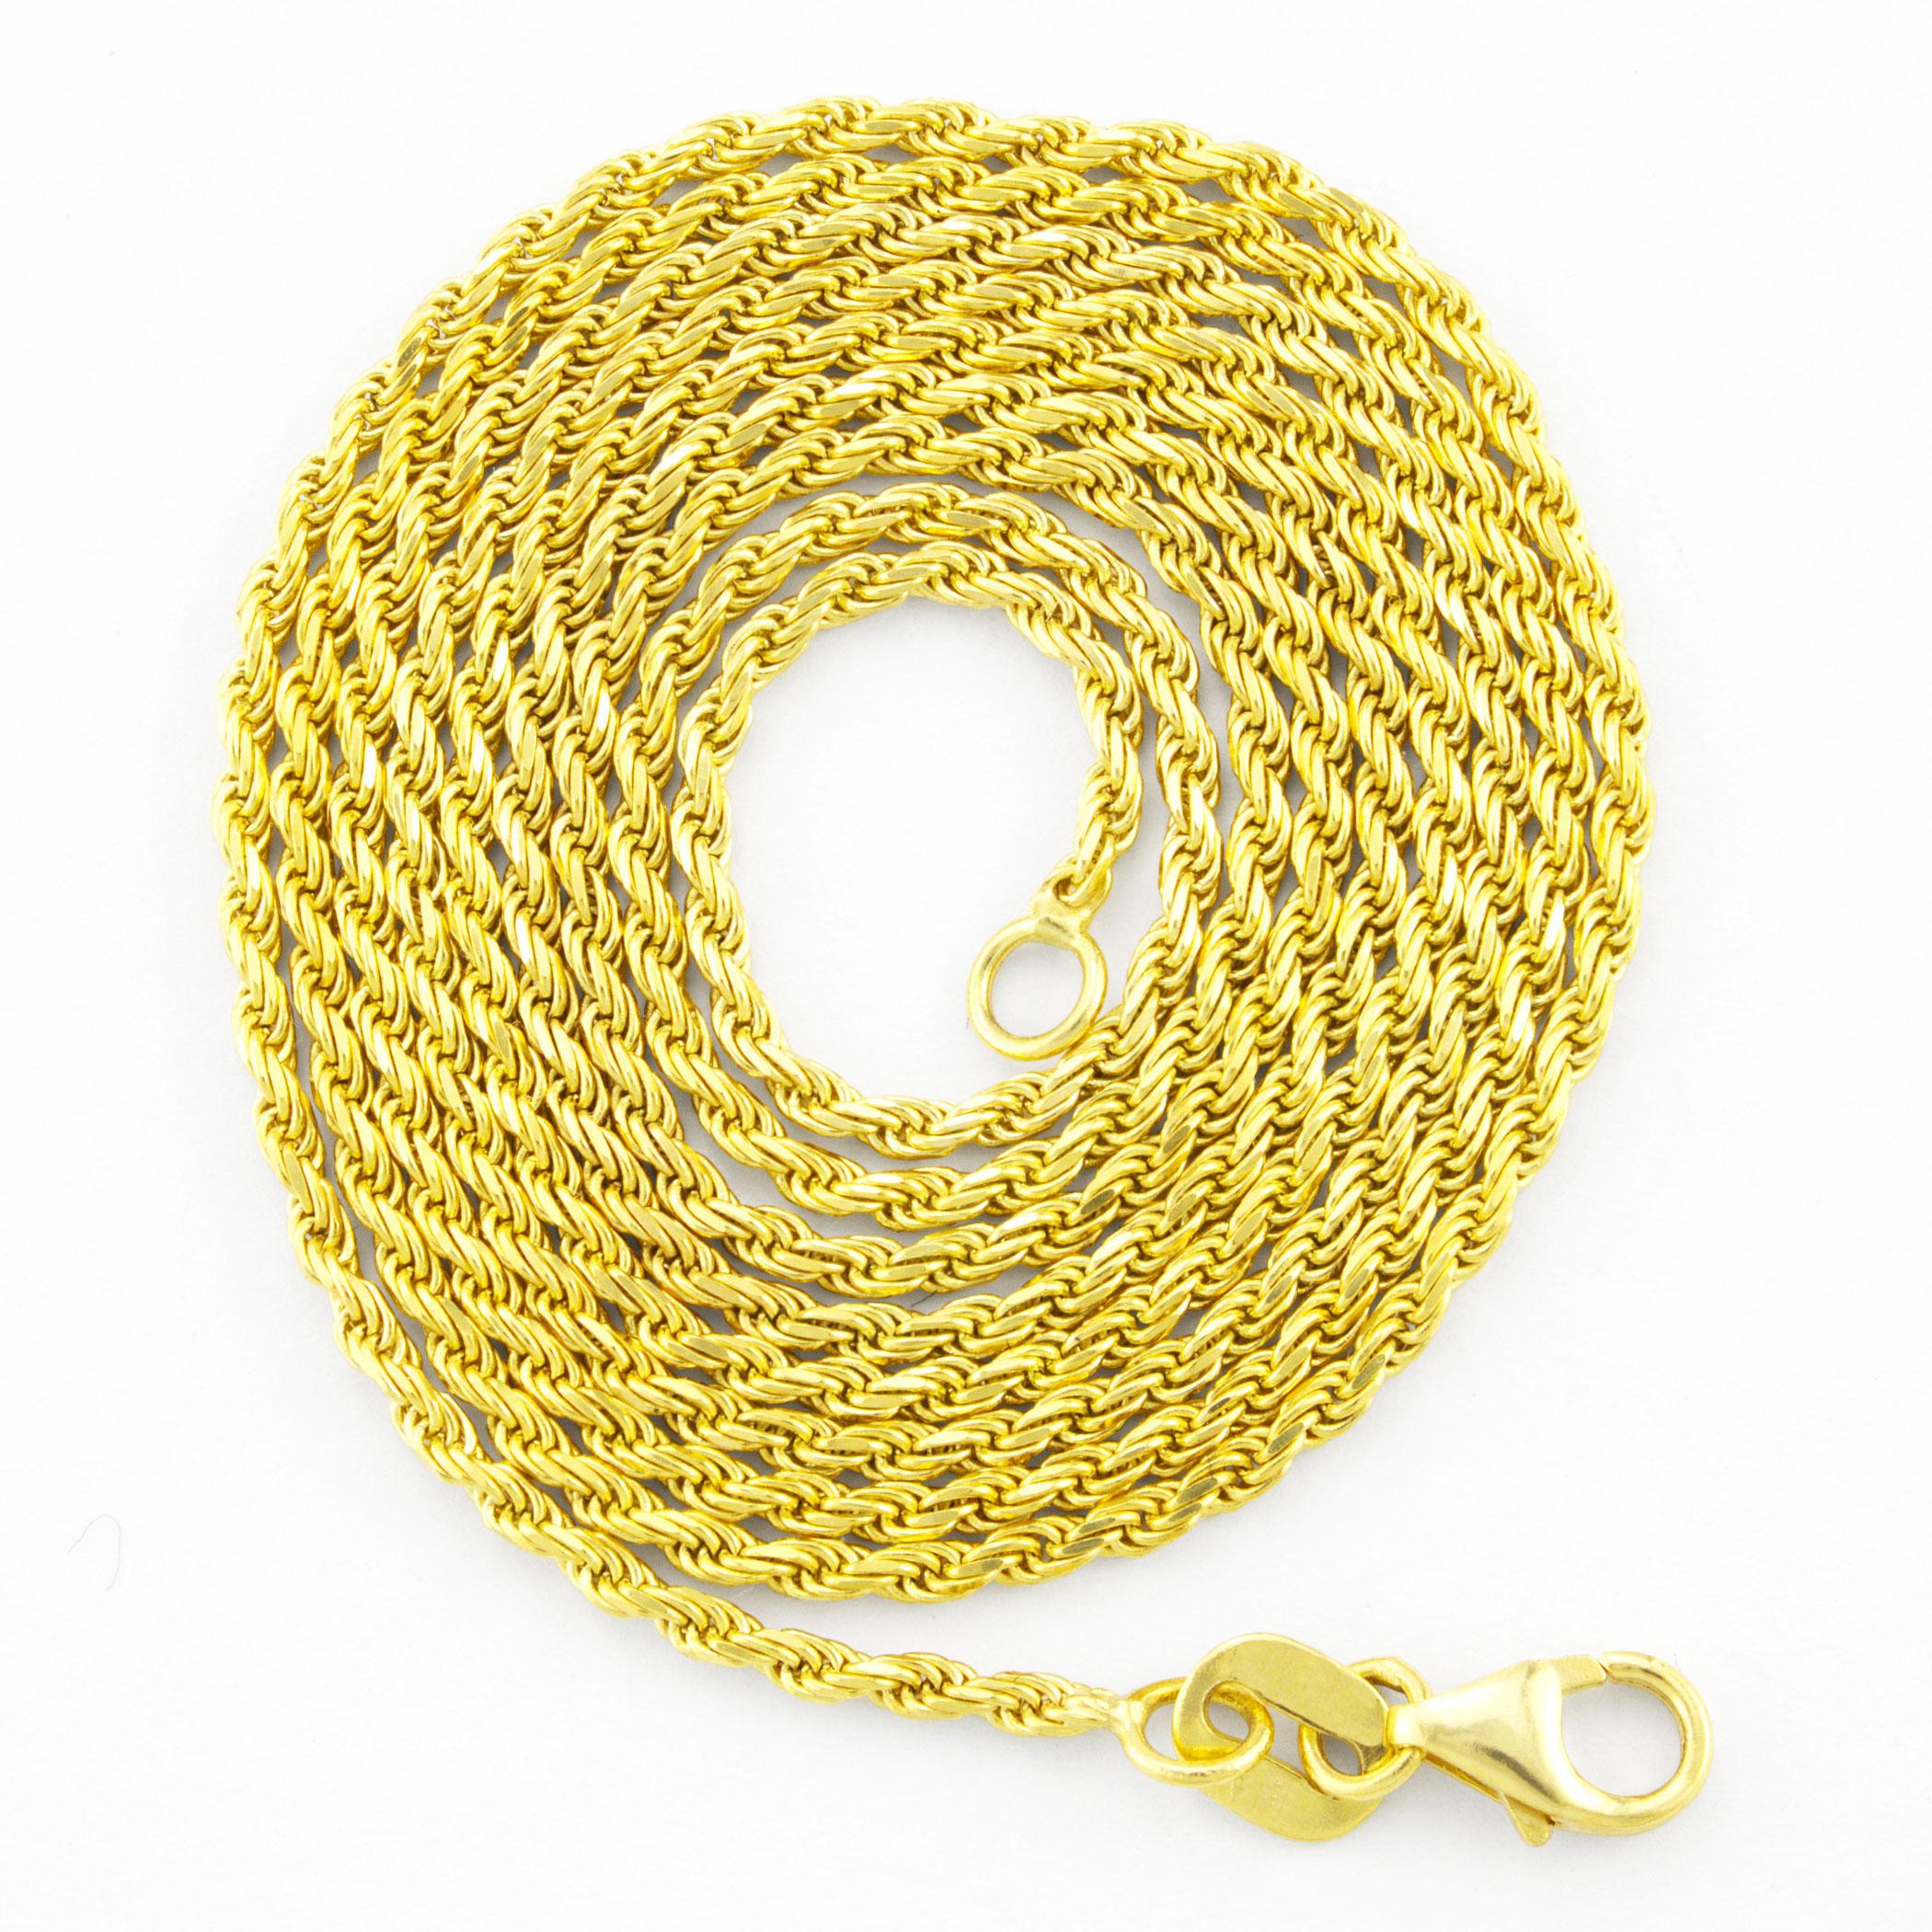 10K-Yellow-Gold-1-5mm-Thin-Diamond-Cut-Rope-Chain-Pendant-Necklace-Women-14-034-26-034 thumbnail 15